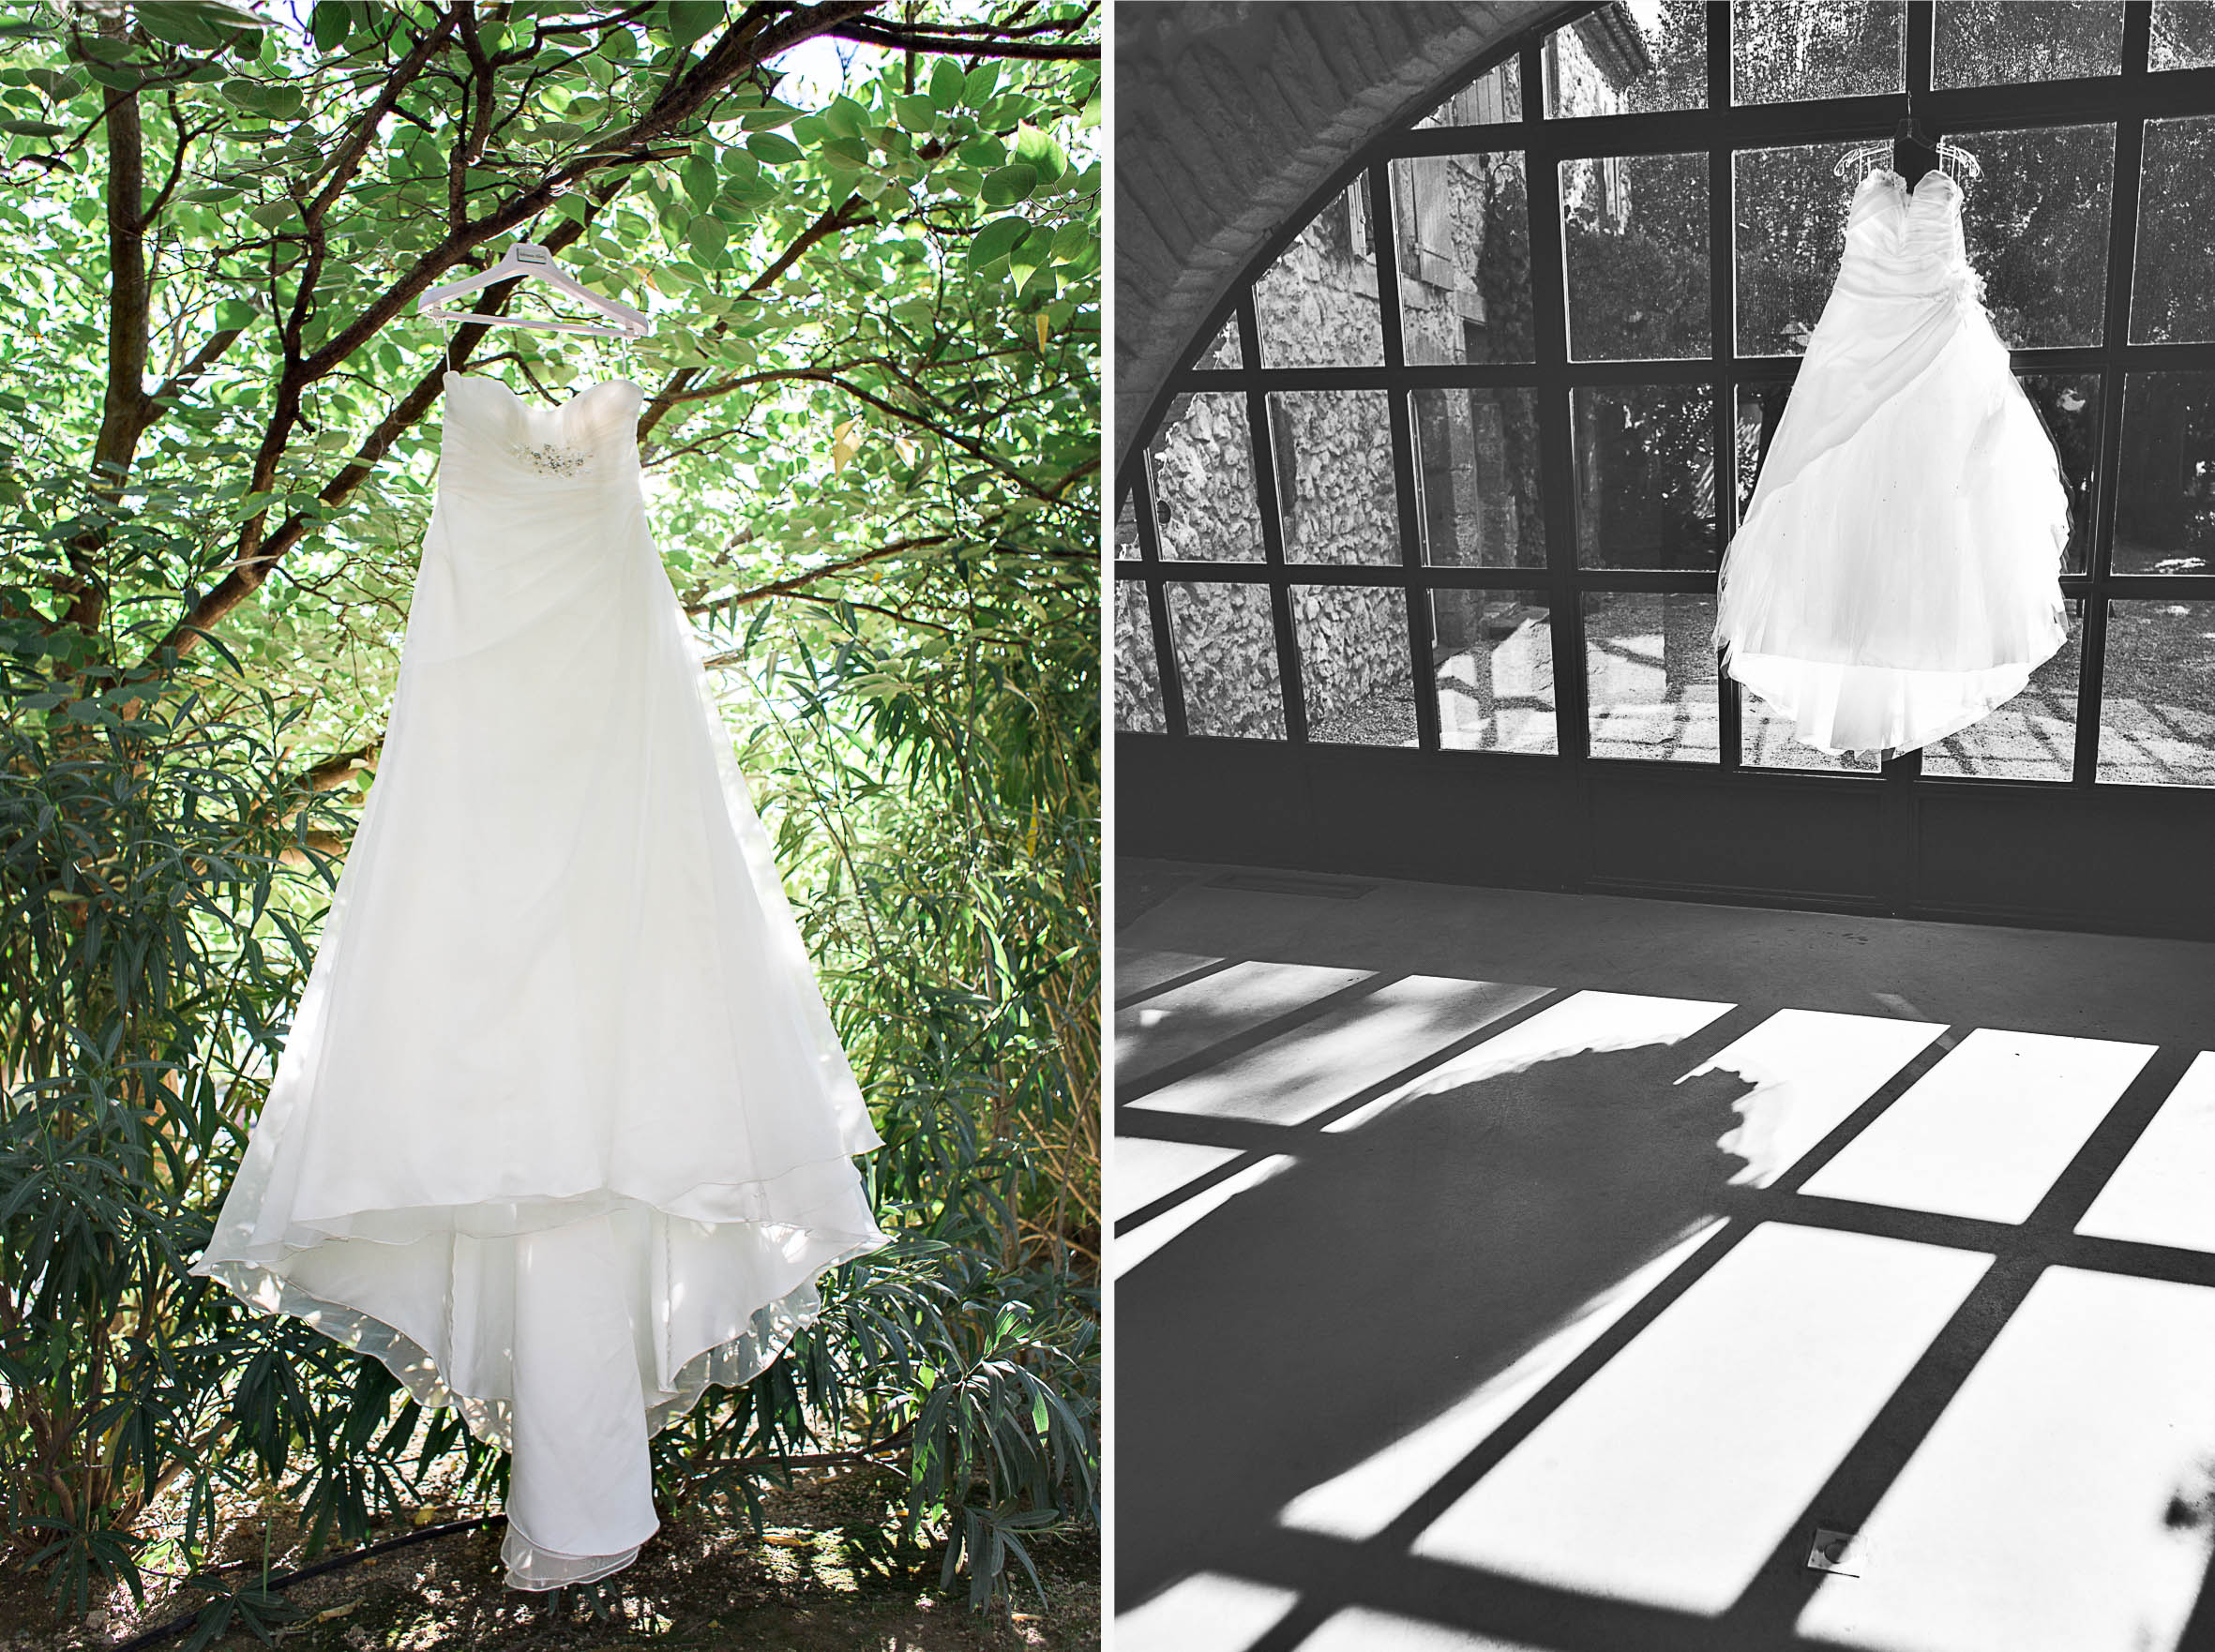 Photographe mariage avignon - Ambre & Amandine-3-1